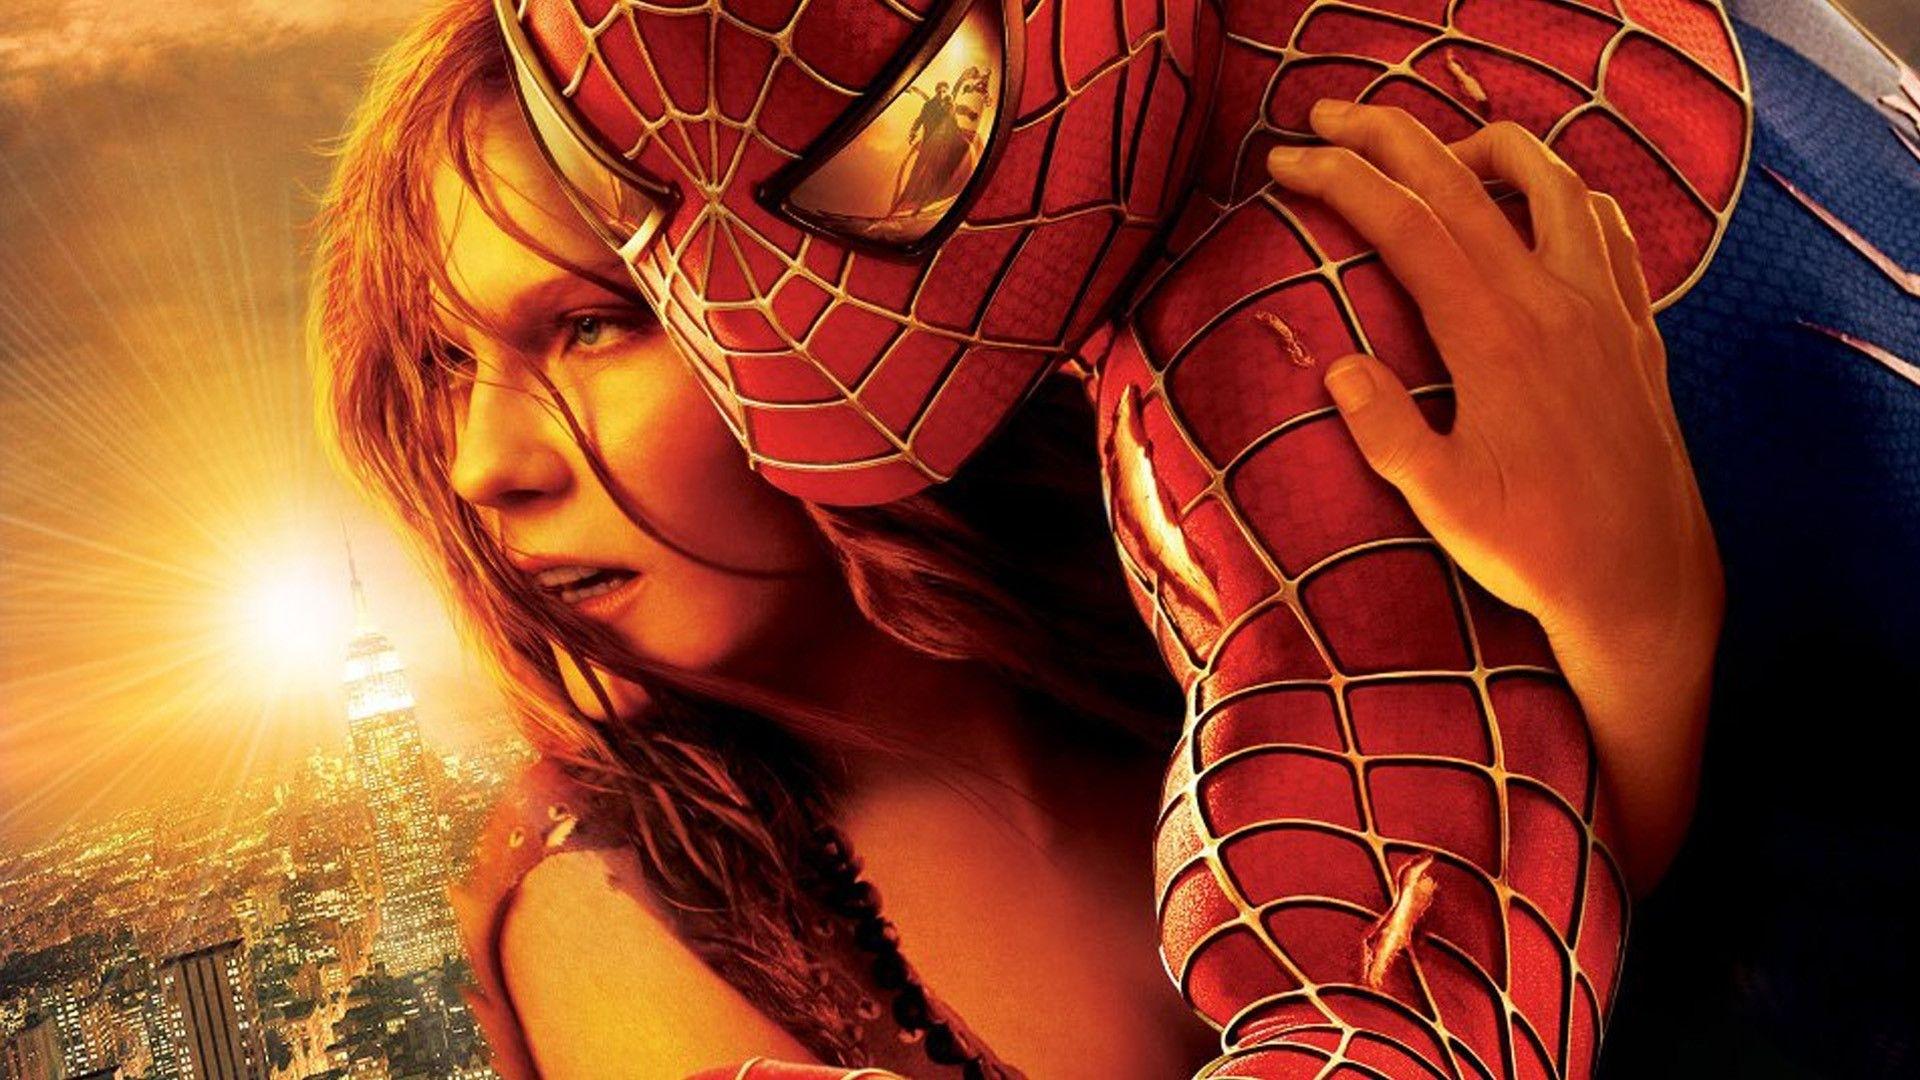 10 Best Spider Man 2099 Wallpaper Hd Full Hd 1920 1080 For: 10 Best Spider-Man 2002 Wallpaper FULL HD 1920×1080 For PC